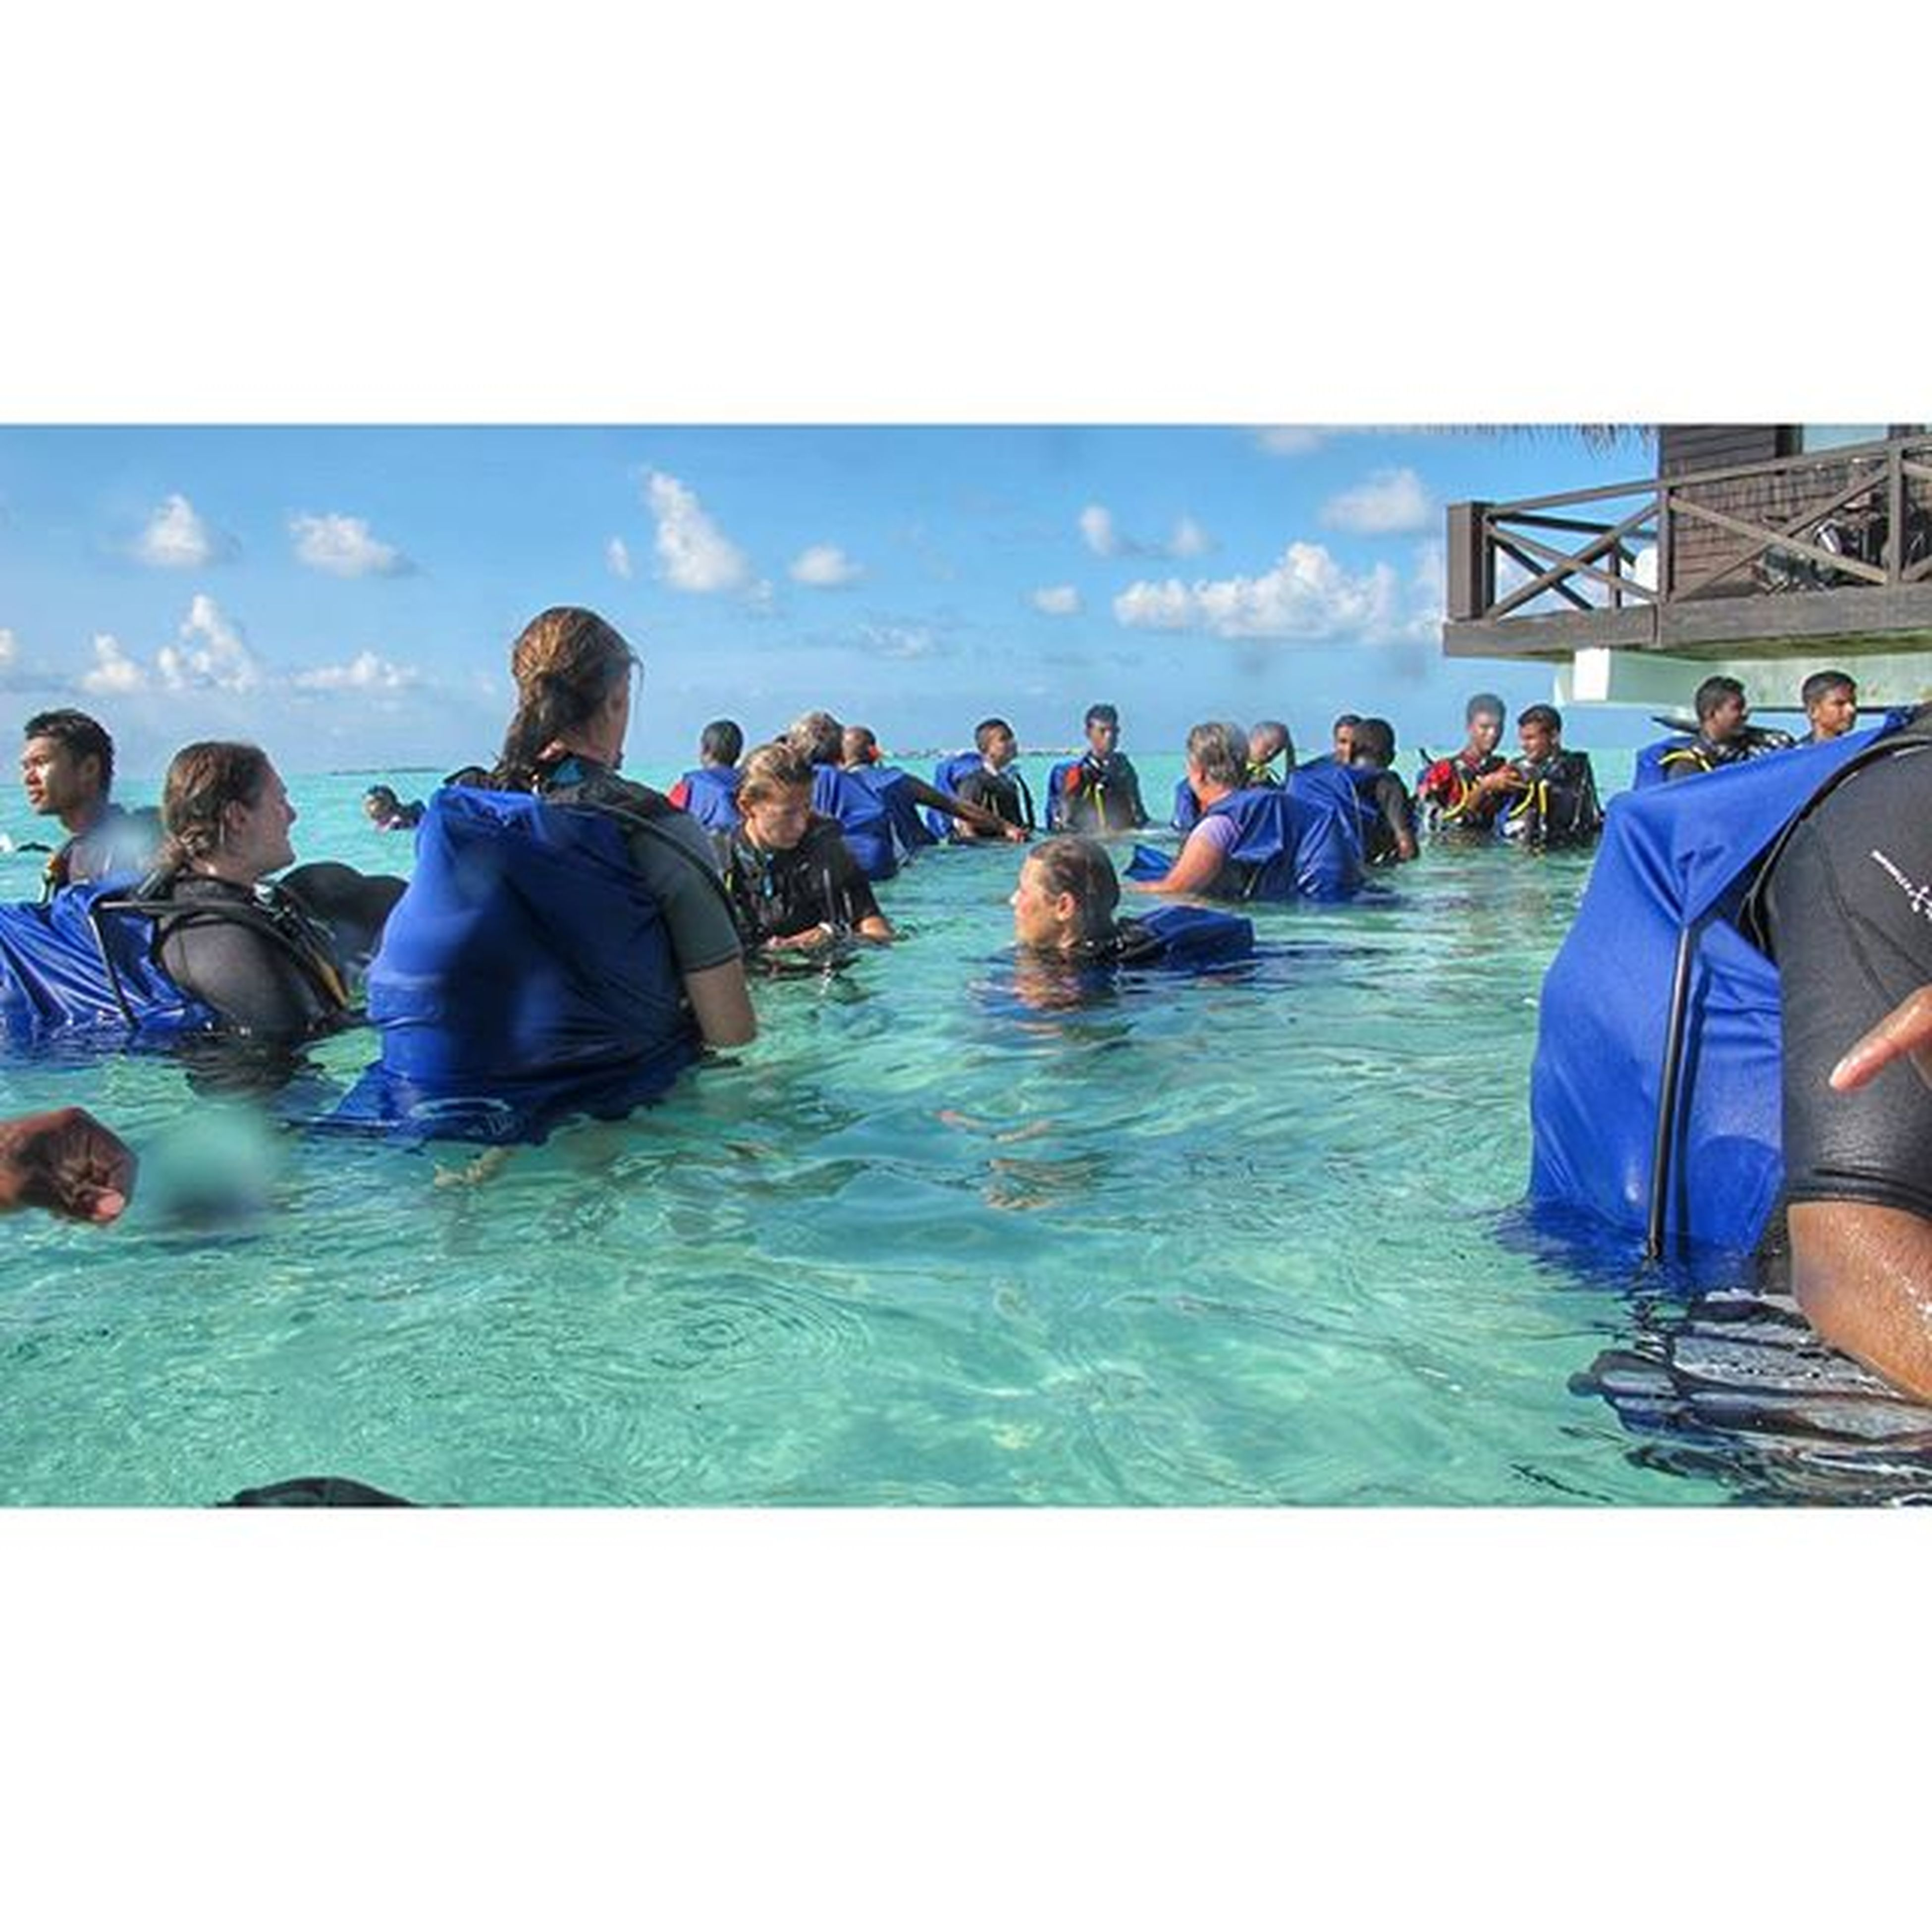 Charitydive Event . WorldDiabetesDay Wdd . Almost around 300 divers made the diabetes bluering scubadive malediven maledives maledivesisland scuba apex bluering beach sunsandsea sunnysideoflife